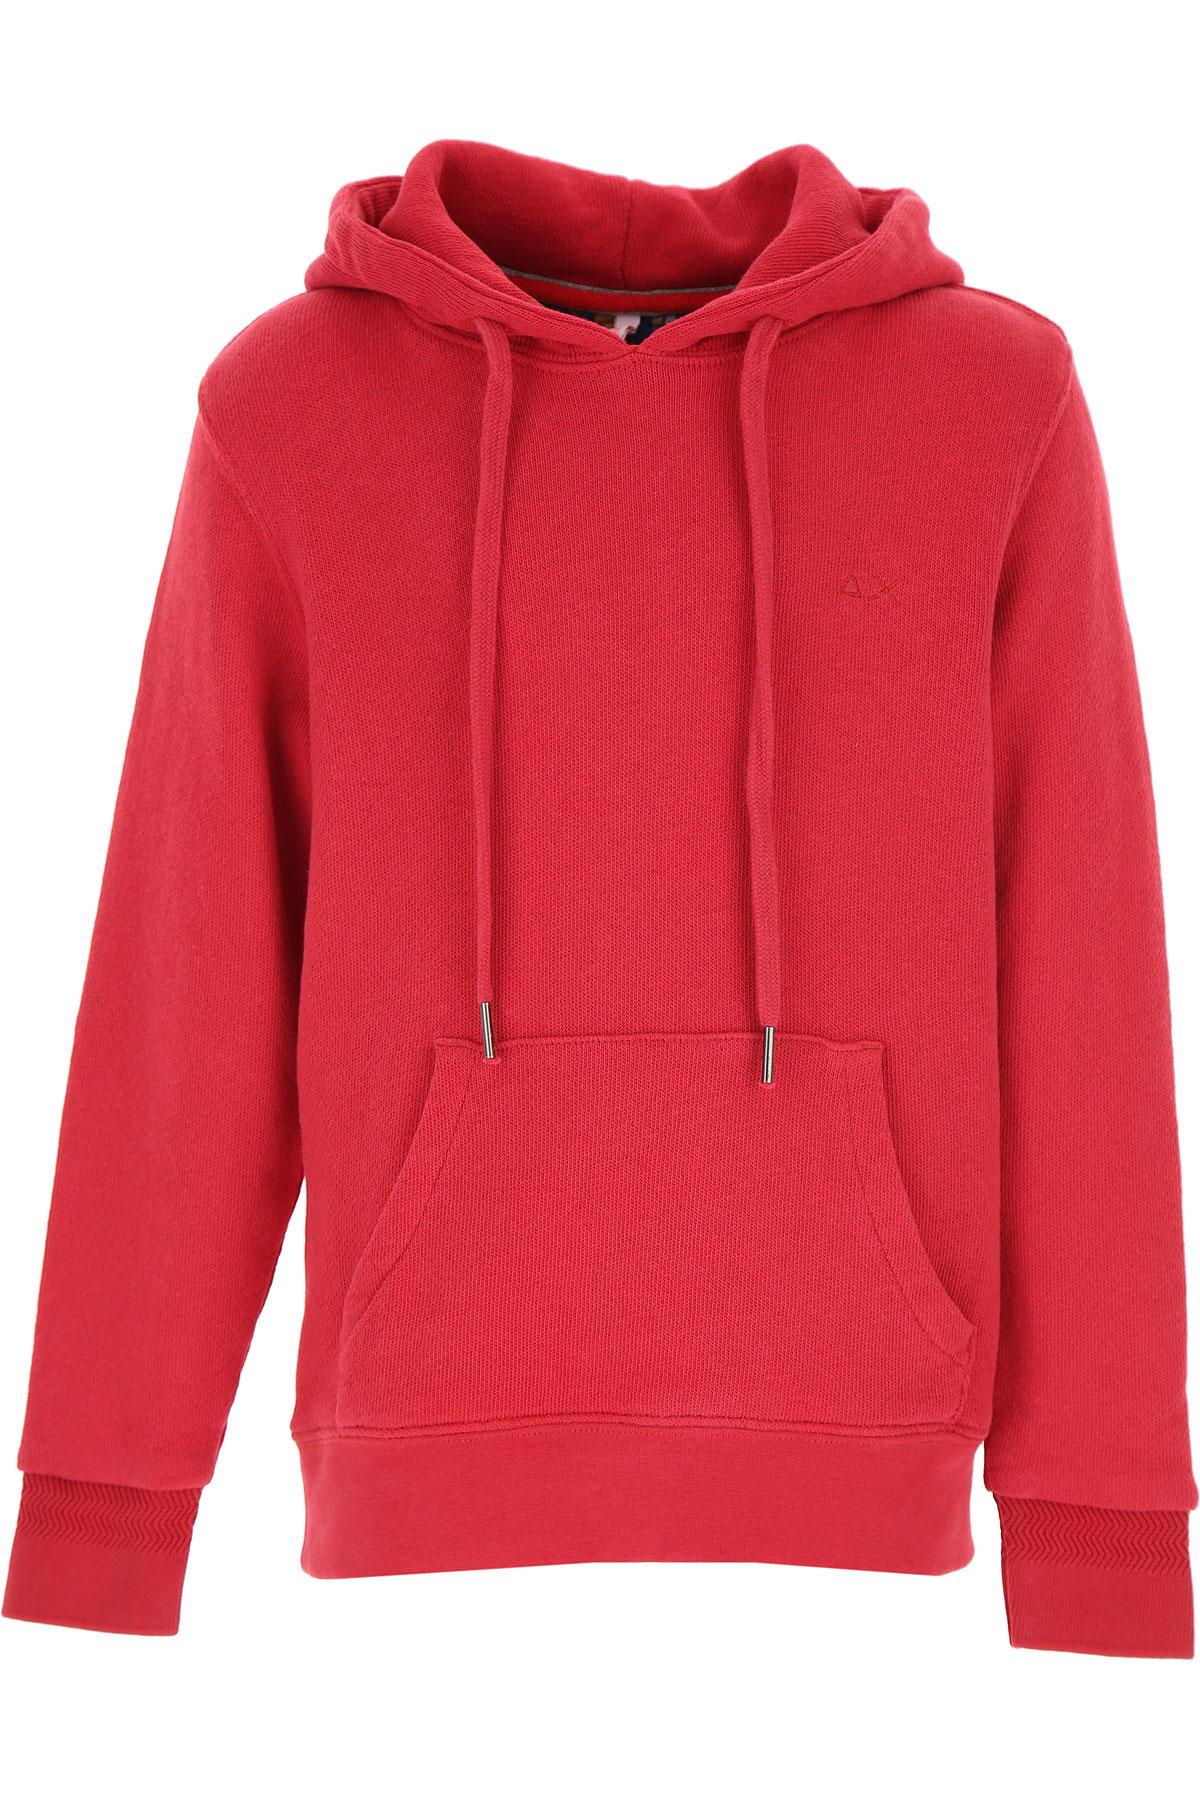 Sun68 Kids Sweatshirts & Hoodies for Boys On Sale, Red, Cotton, 2019, 10Y 14Y 4Y 6Y 8Y